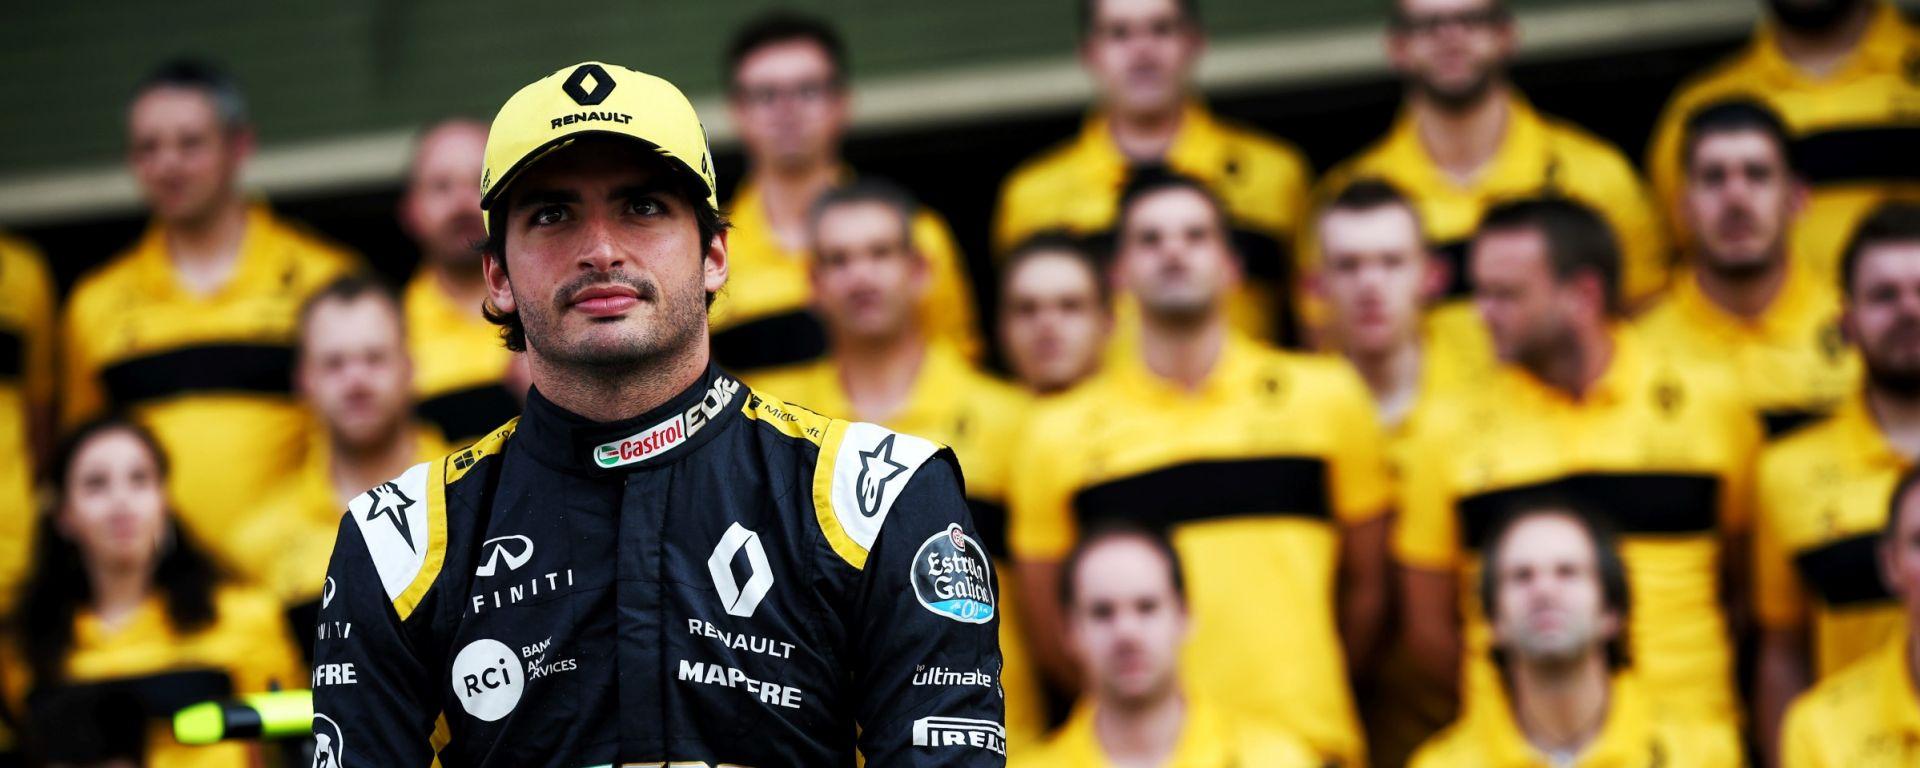 F1 2018: Carlos Sainz (Renault)